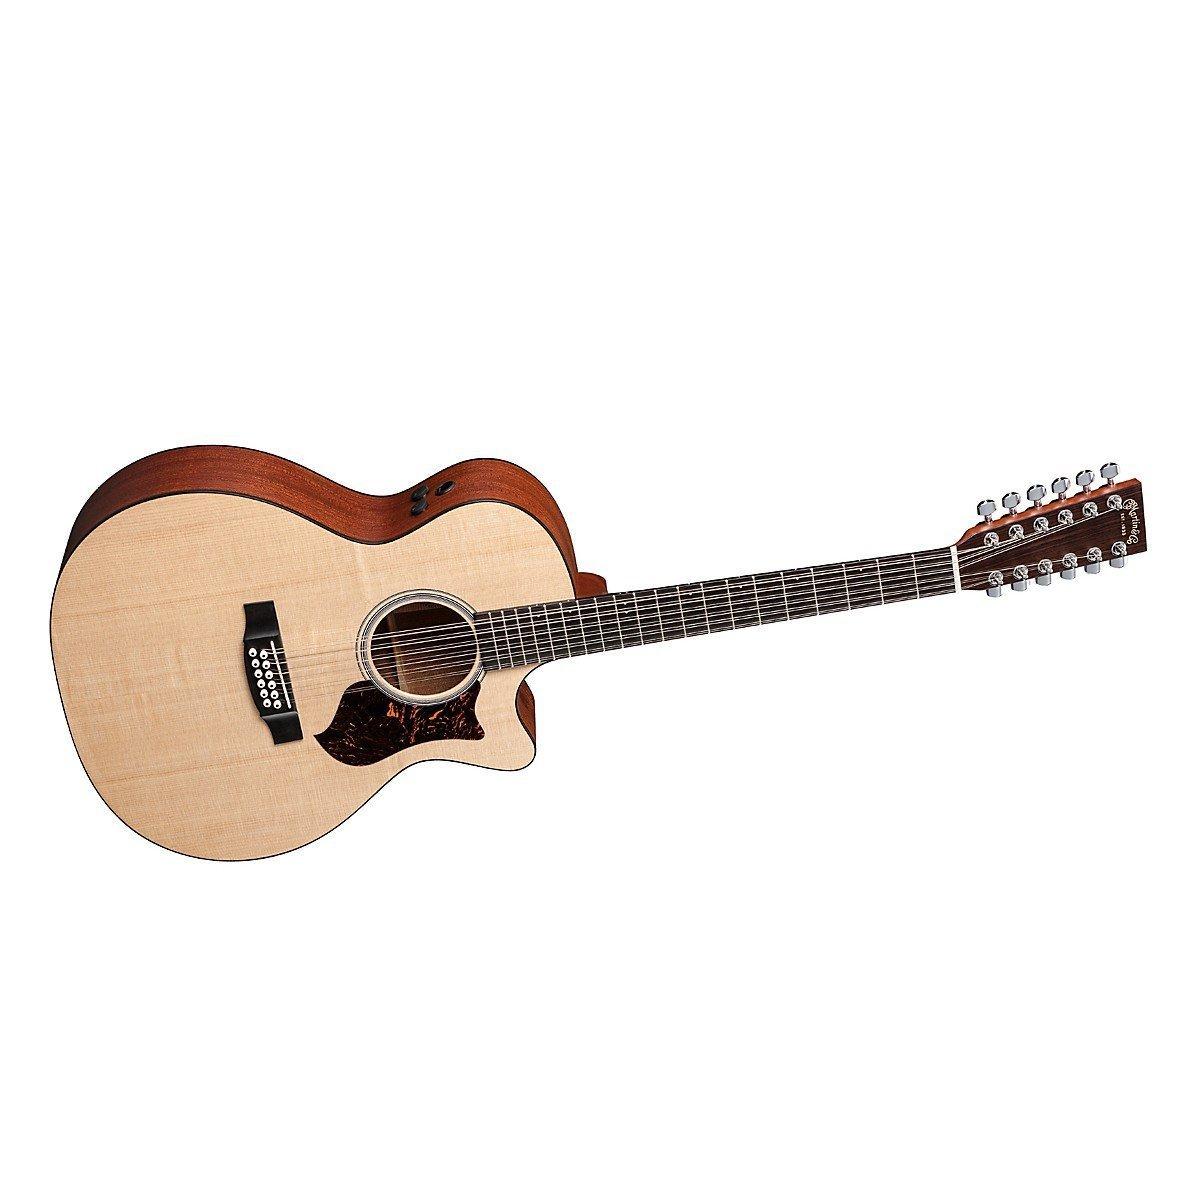 martin gpc12pa4 12 string acoustic electric guitar w case ebay. Black Bedroom Furniture Sets. Home Design Ideas